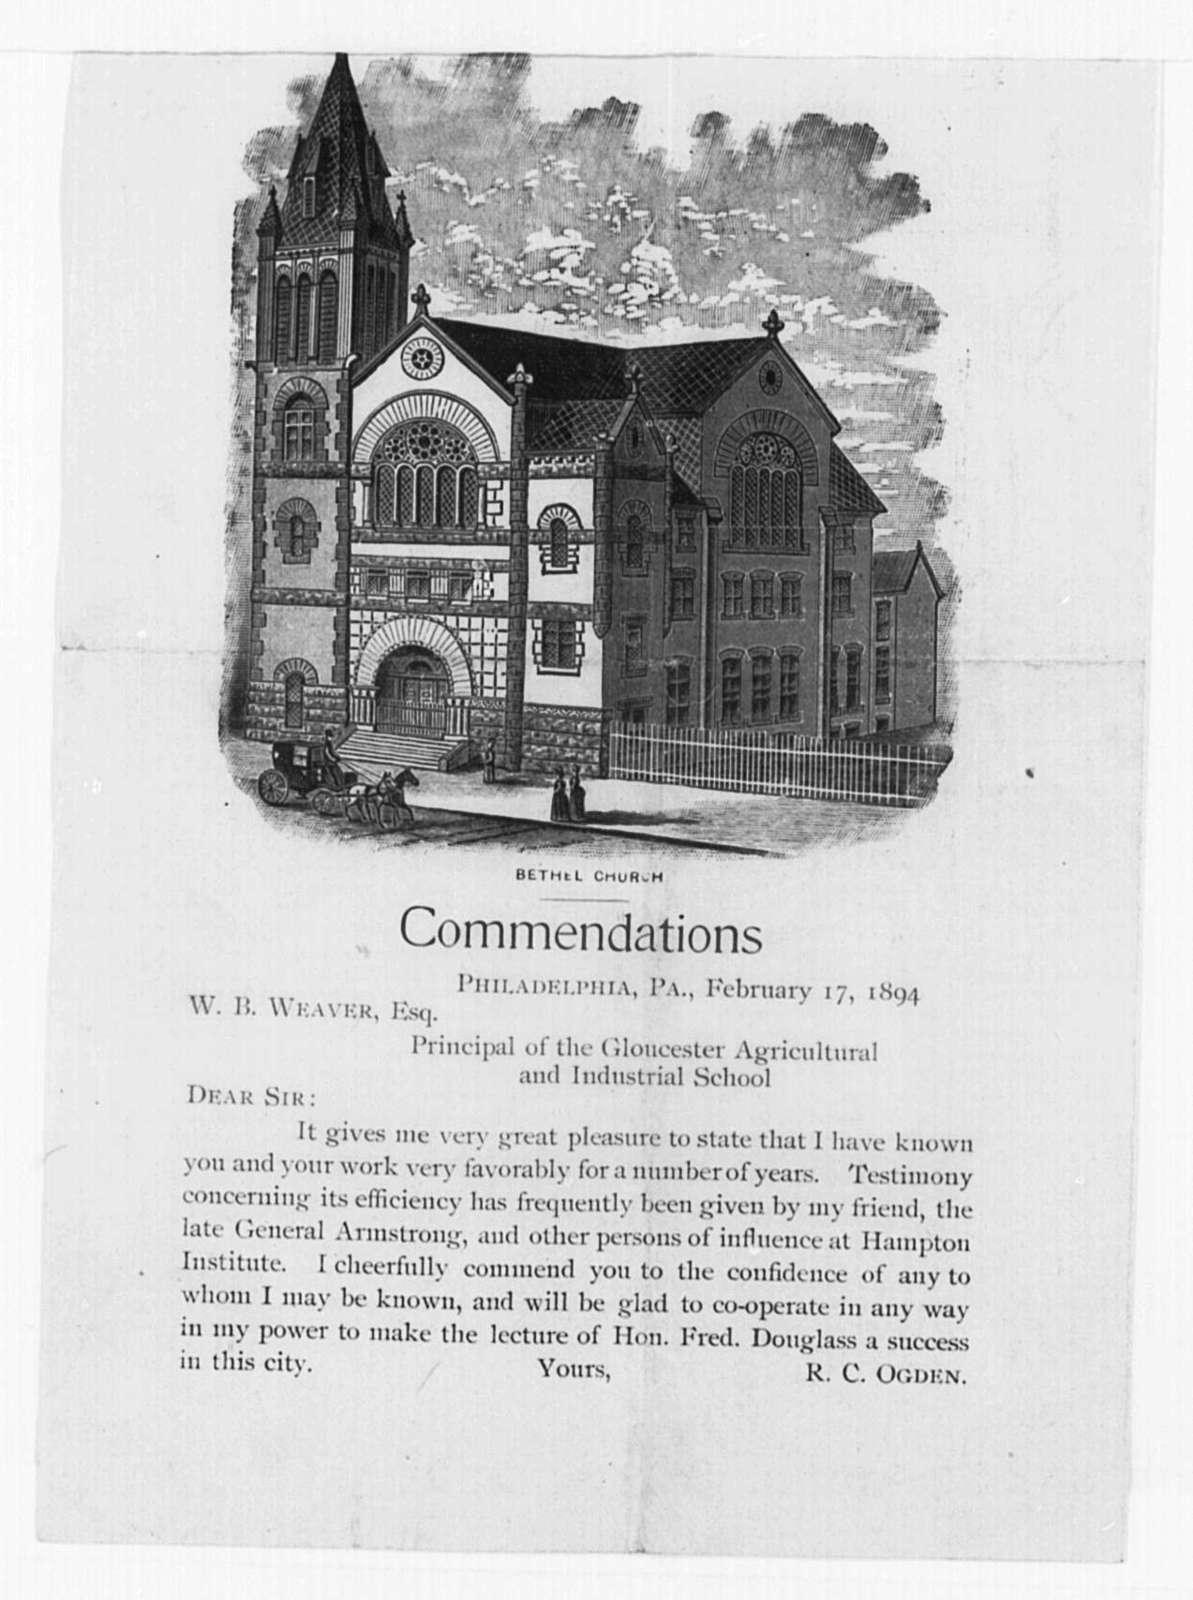 Douglass, Frederick (General) - Folder 6 of 9